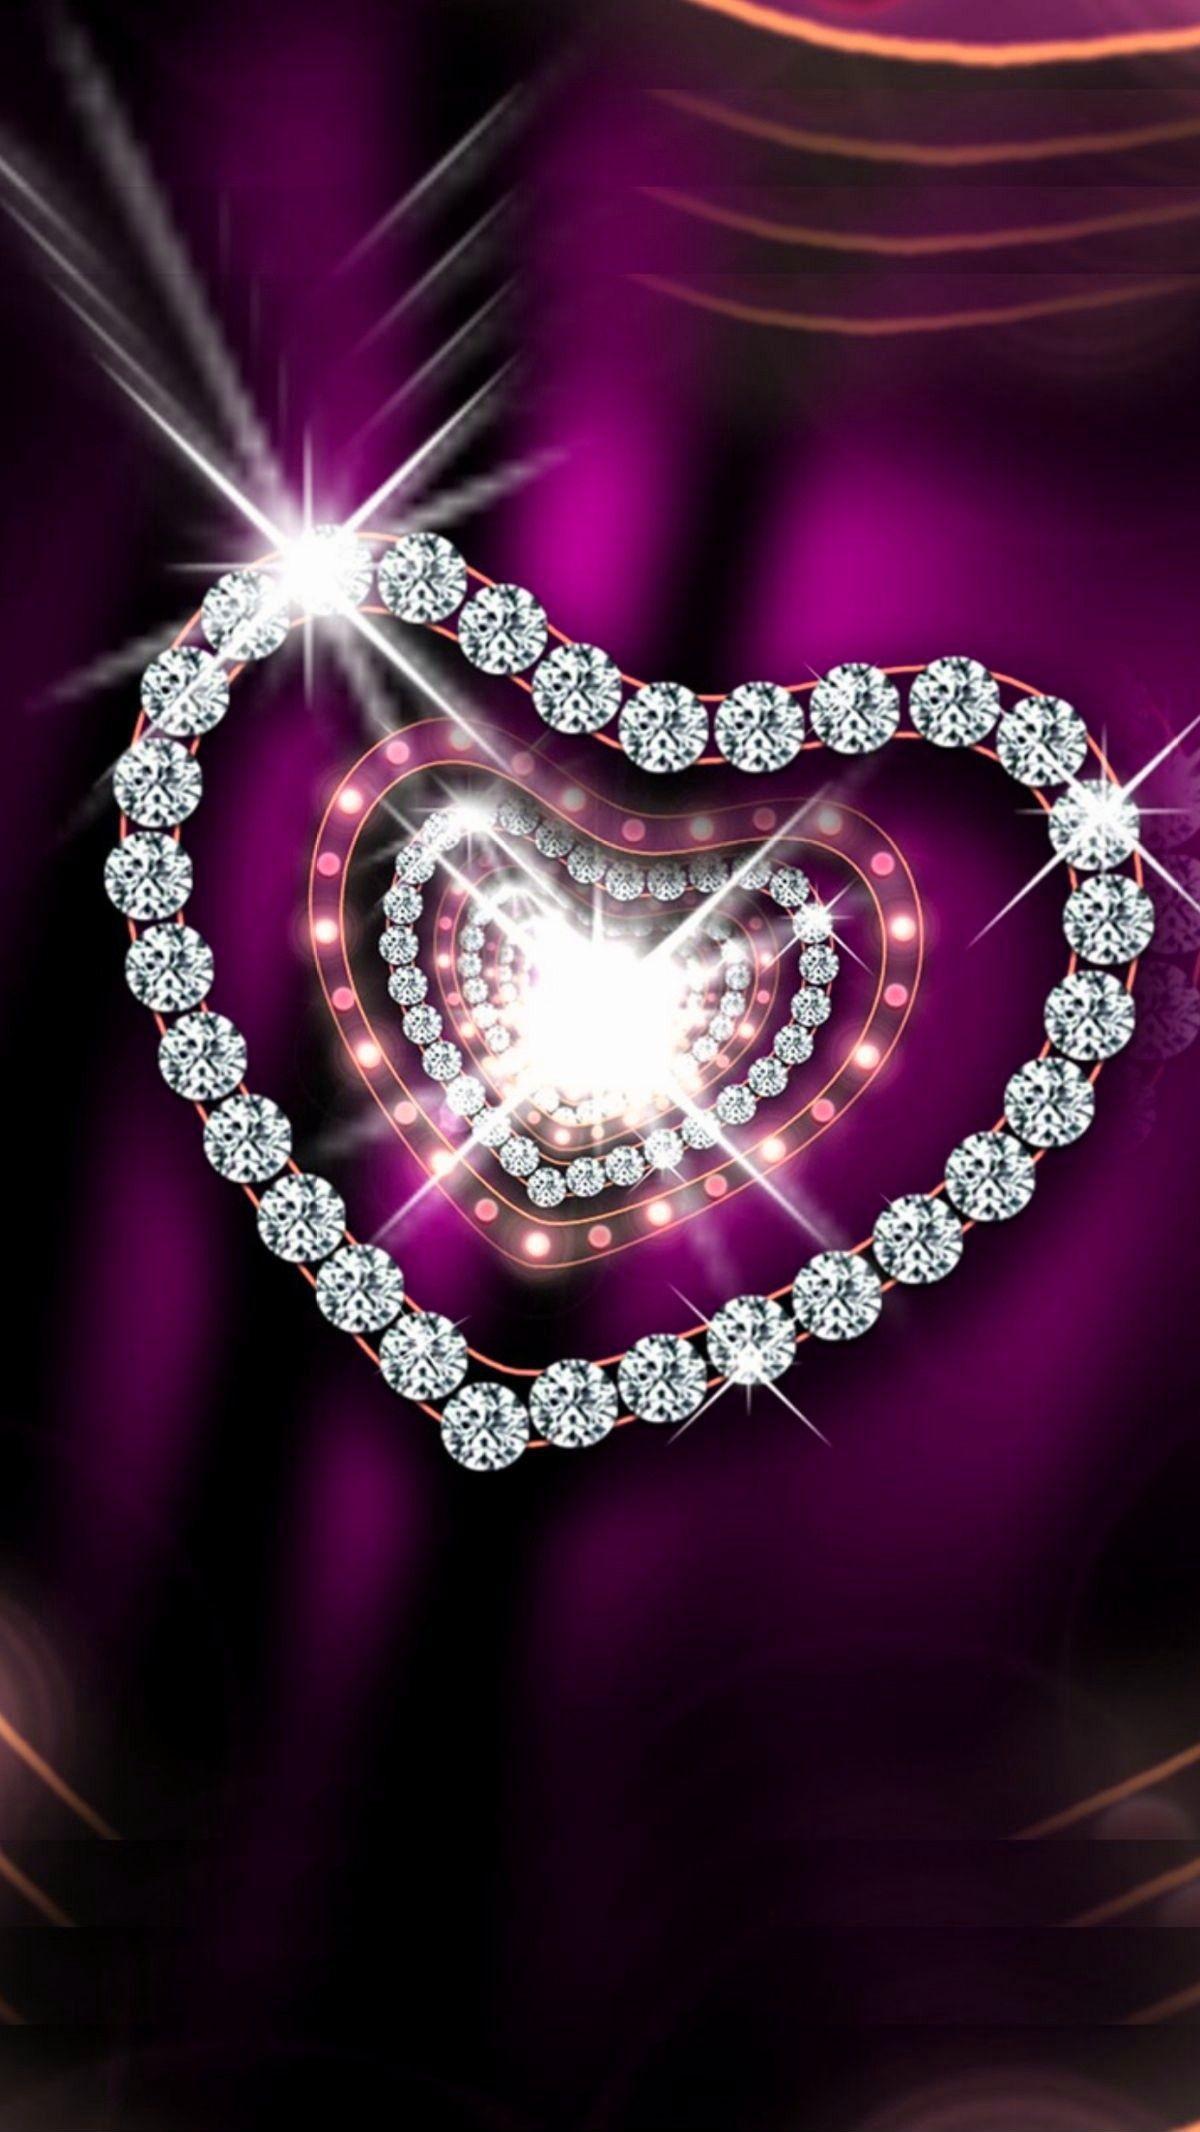 Res: 1200x2132, Purple and silver diamonds